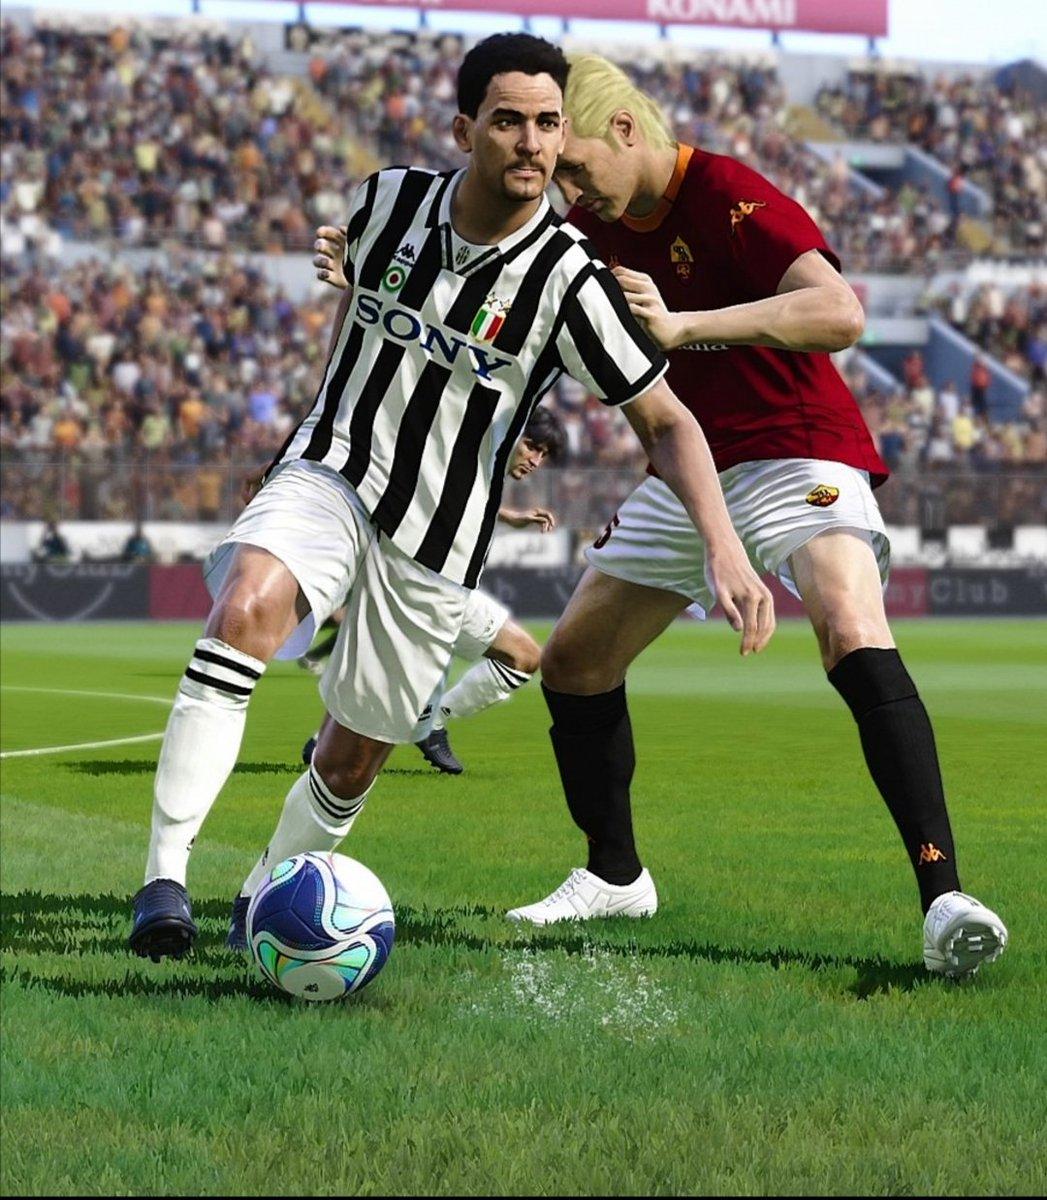 V1 @PESUniLegends classic clubs file 🔥 #eFootballPES2021 #PES2021 #PESUniverse #RomaJuve #Baggio #SerieA https://t.co/XW7Lh1ijPn